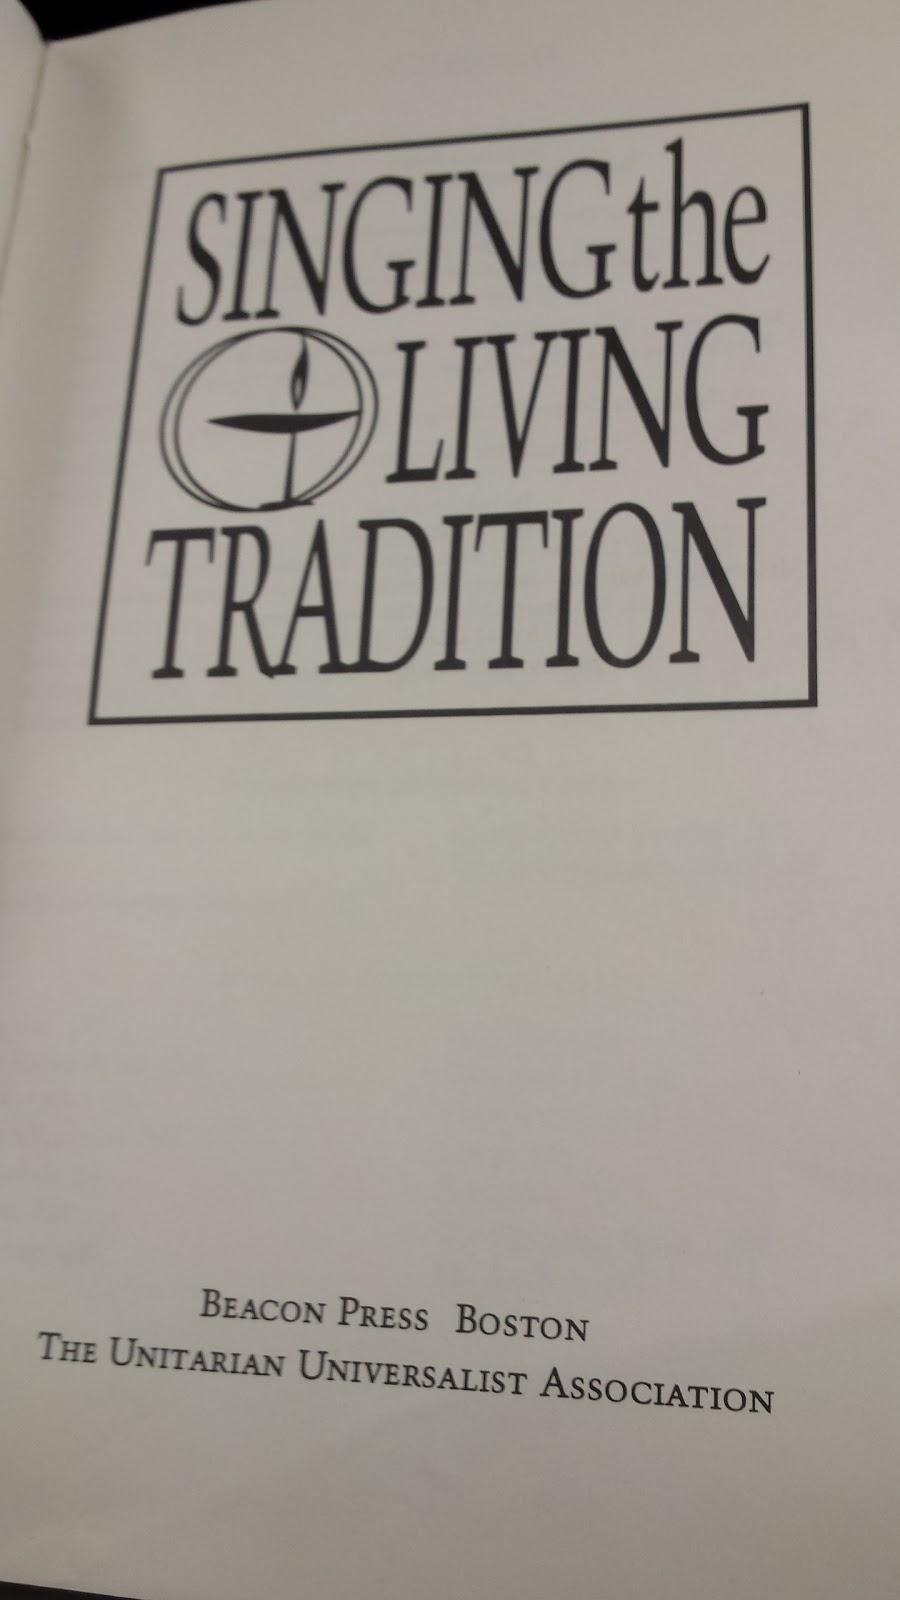 Regina Unitarian Fellowship of Regina Inc | church | 2700 College Ave, Regina, SK S4T 1V1, Canada | 3065227357 OR +1 306-522-7357